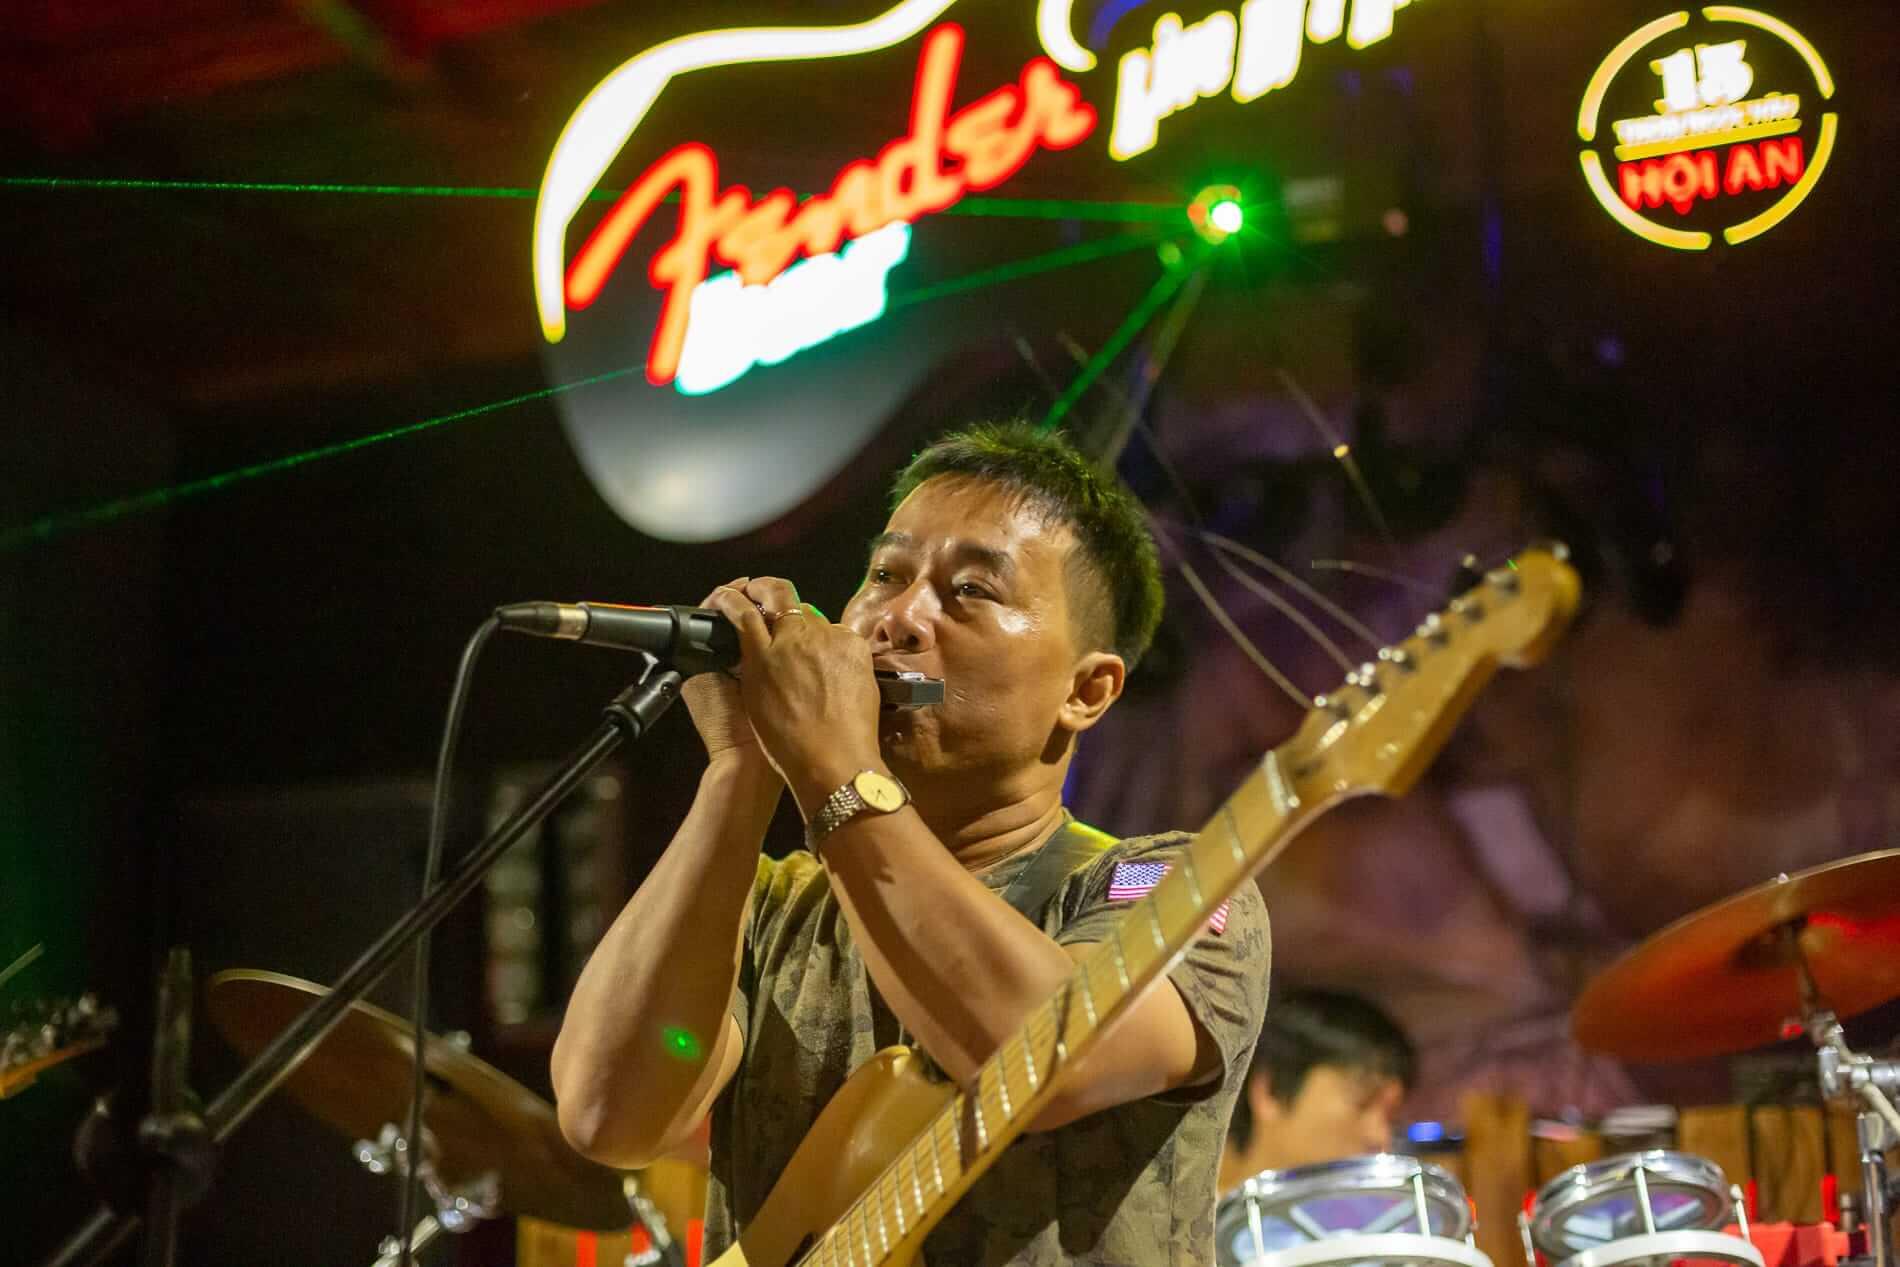 Tam on stage at Fender Bar